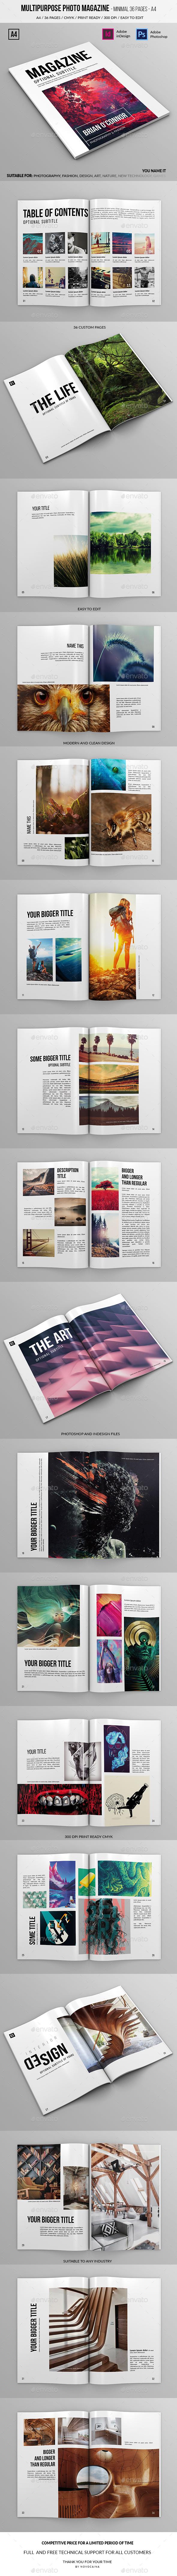 Multipurpose A4 Photo Magazine 36 Pages - Magazines Print Templates